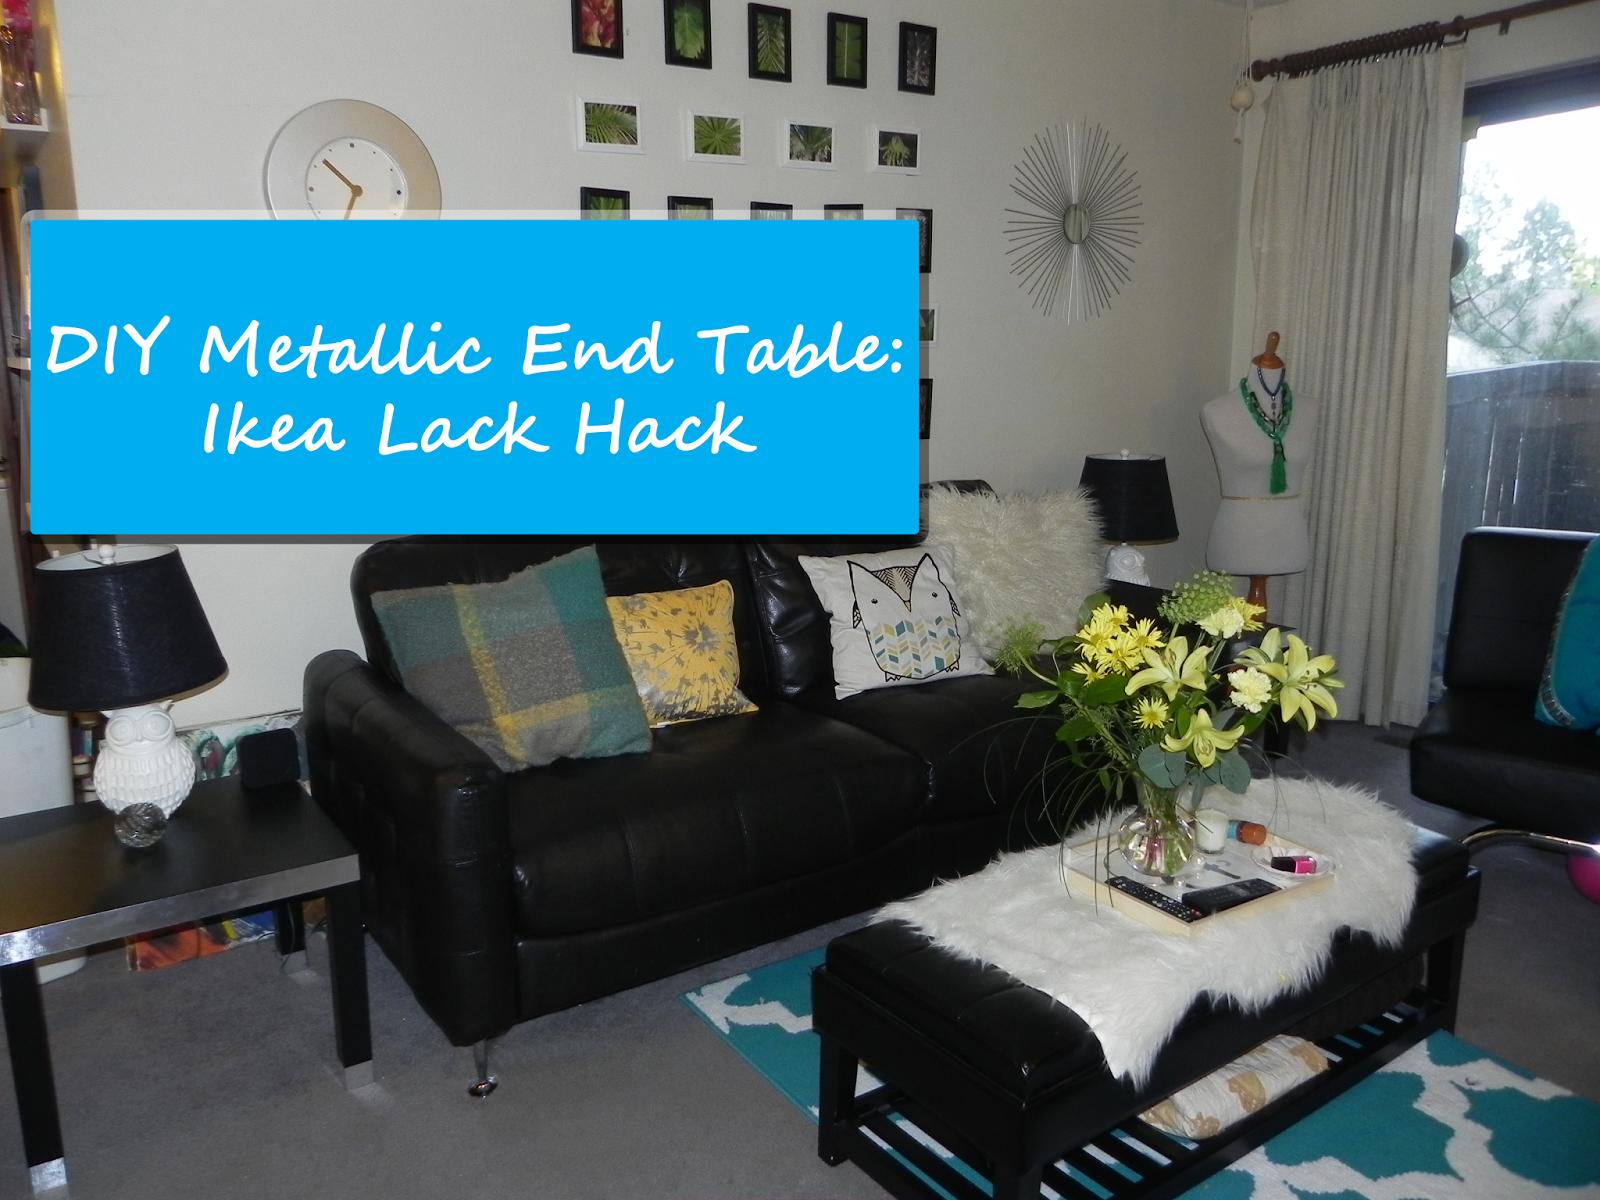 Smart N Snazzy: DIY Metallic End Table ~ Ikea Lack Hack